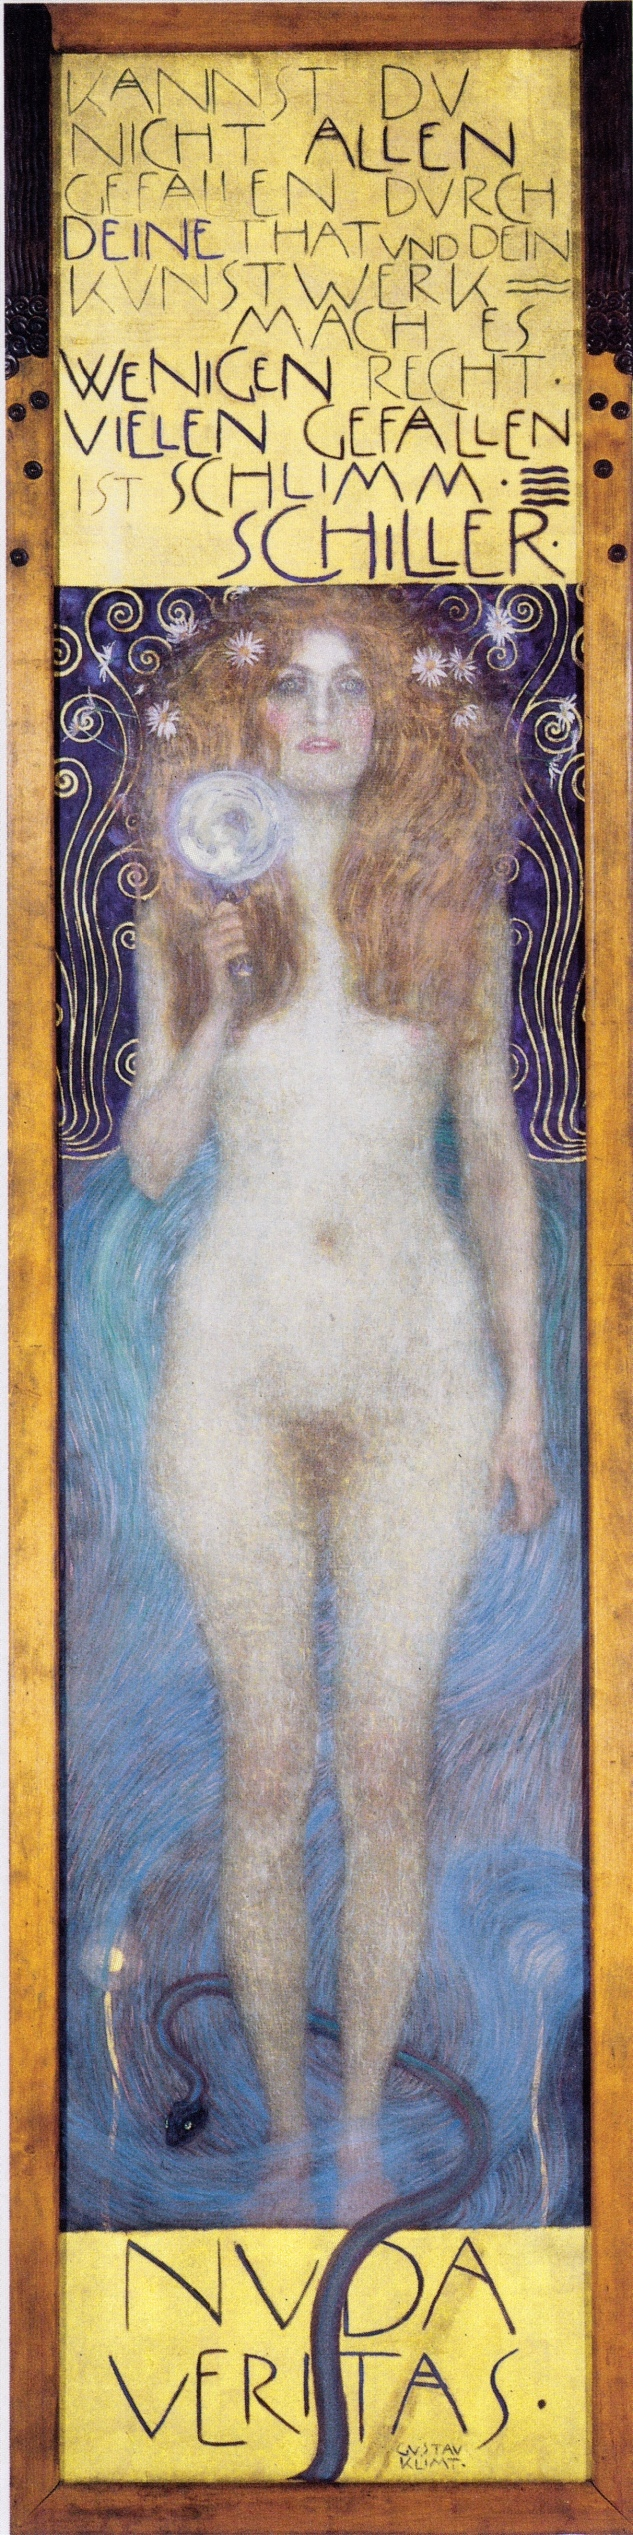 Klimt_-_Nuda_Veritas_-_1899